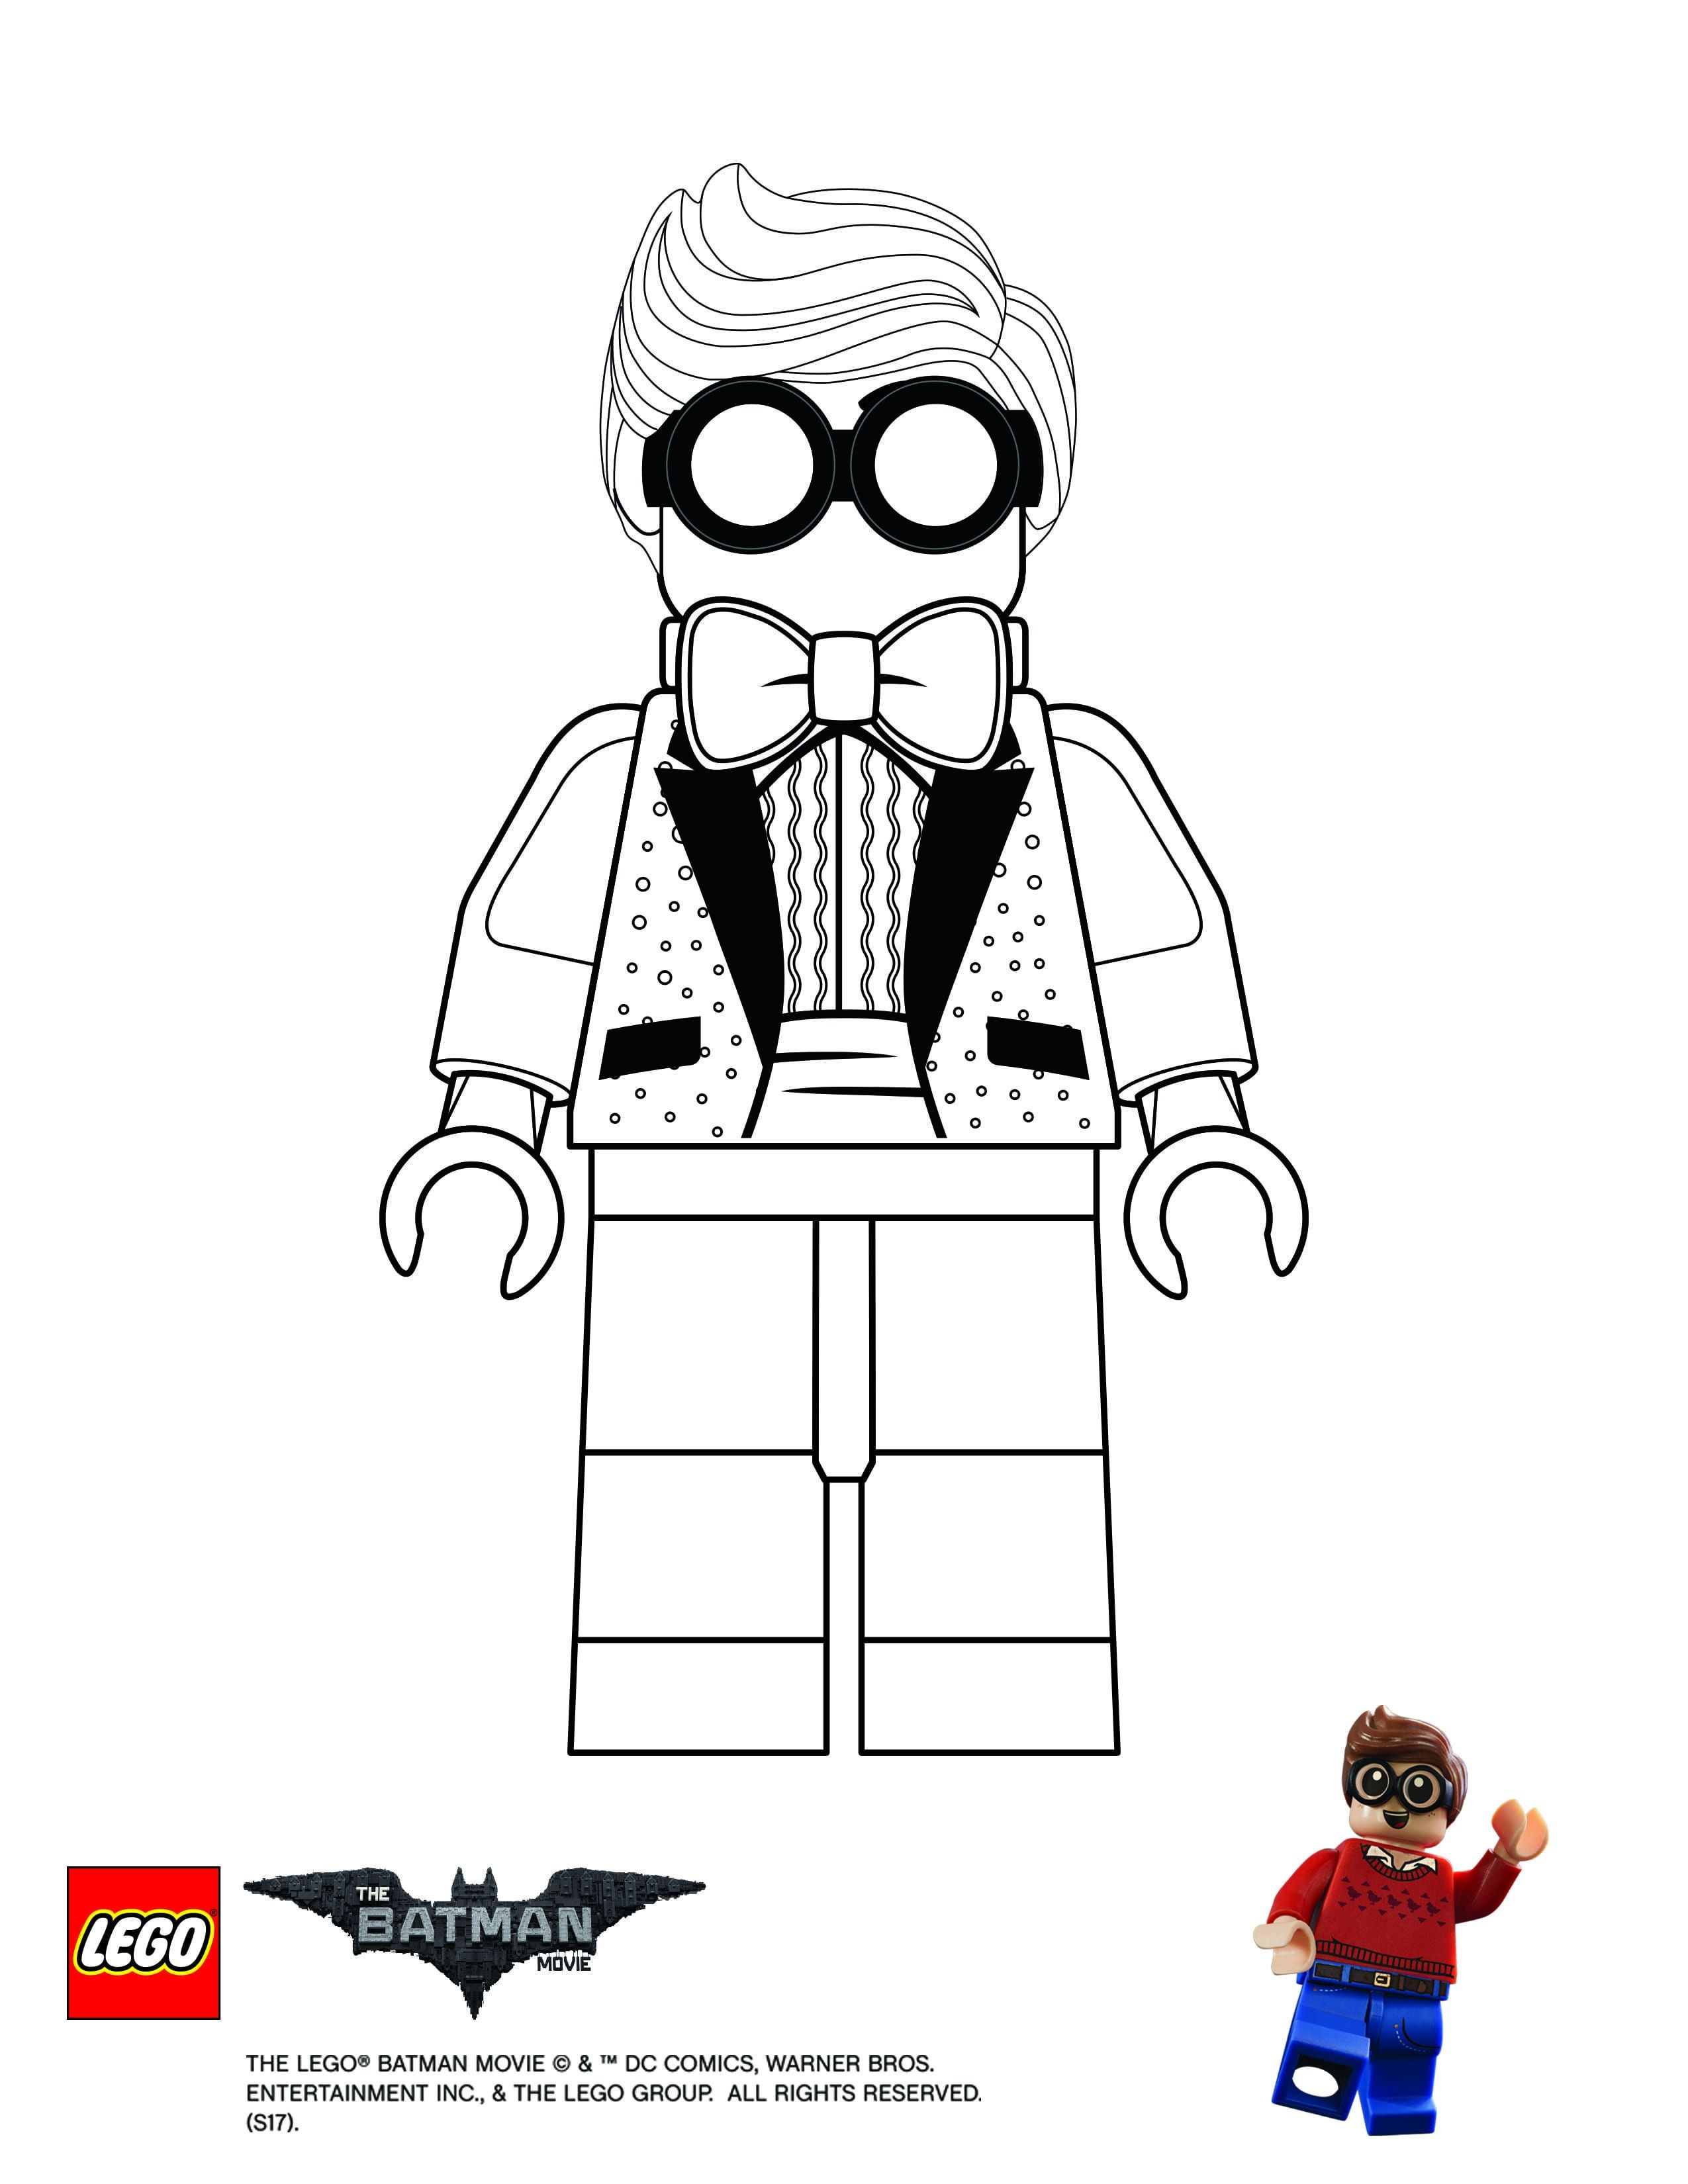 coloriage batman lego marque 38 frisch ausmalbilder lego